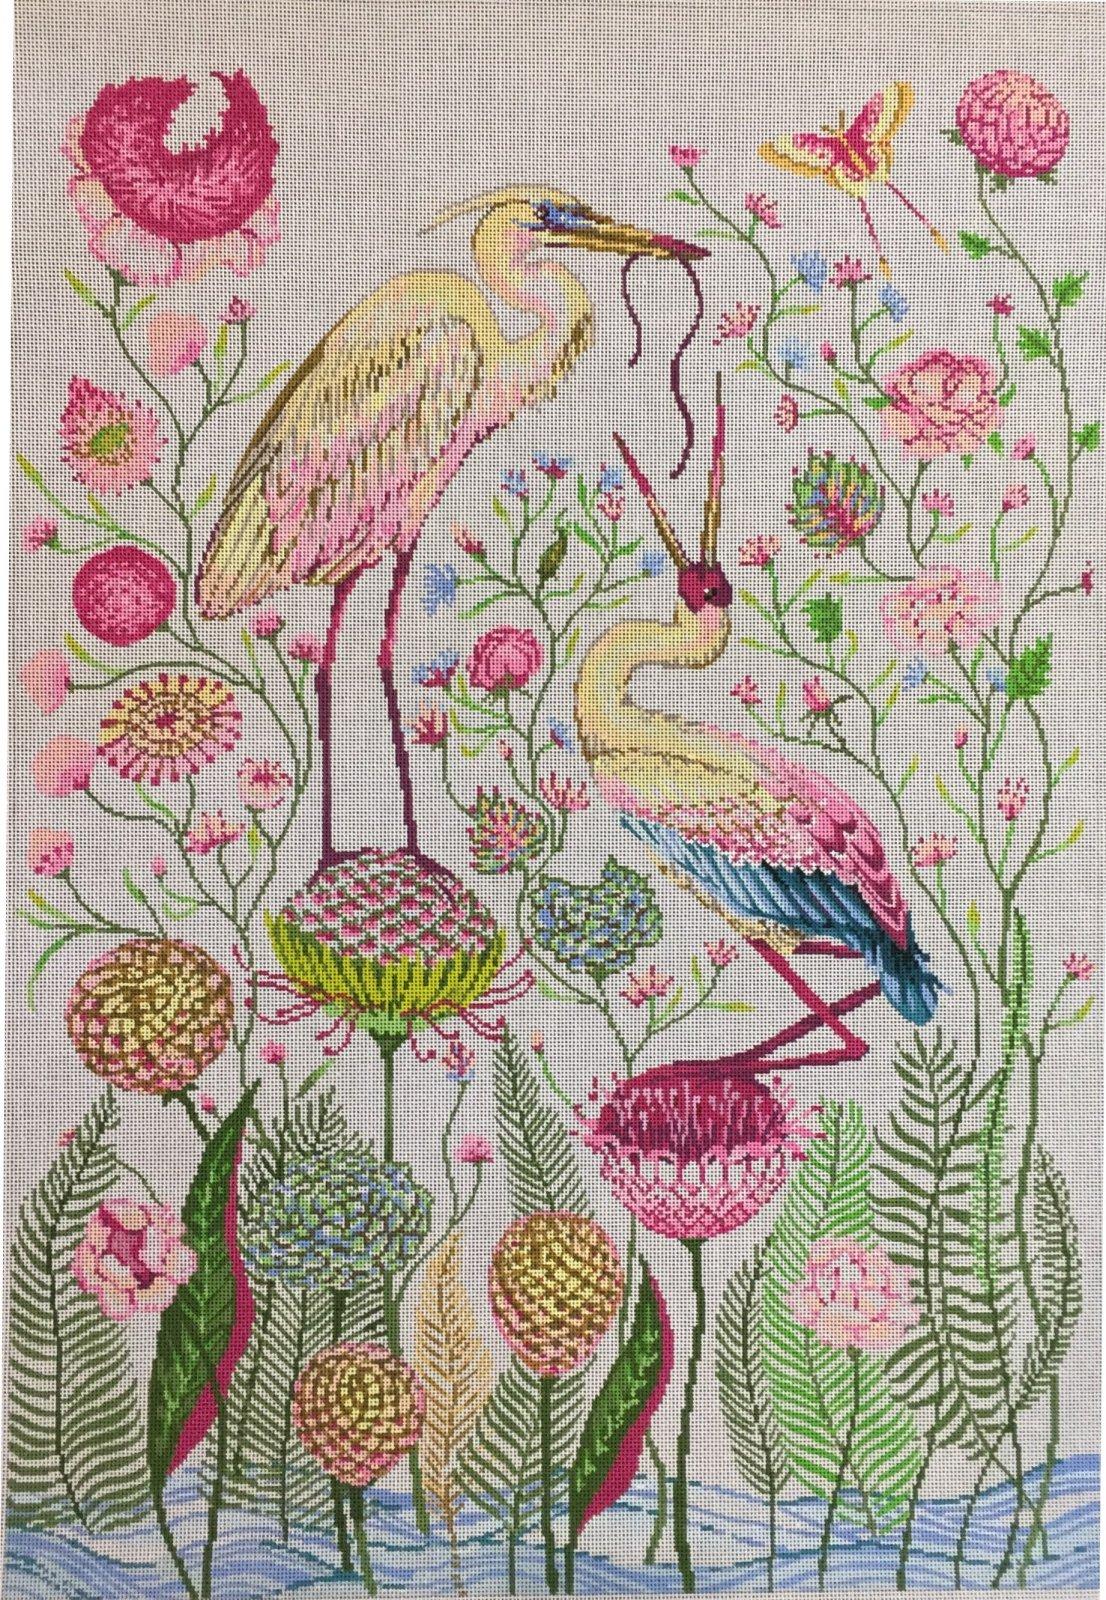 ASIT203 Pink Cranes